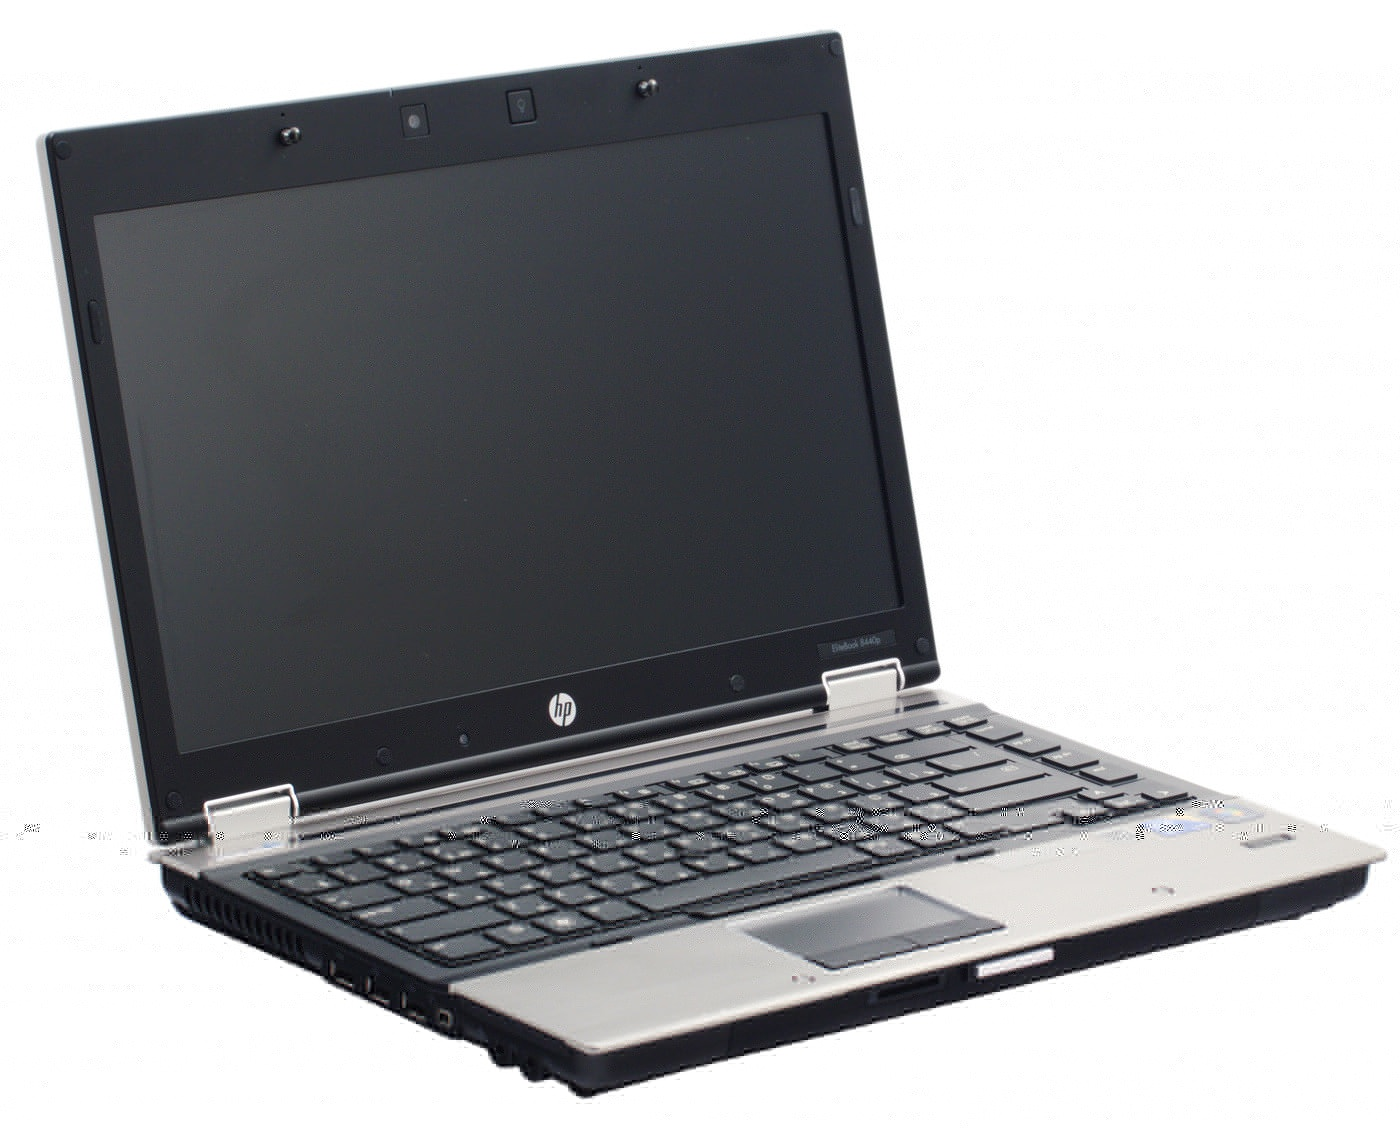 HP EliteBook 8440p Notebook Qualcomm Mobile Broadband Treiber